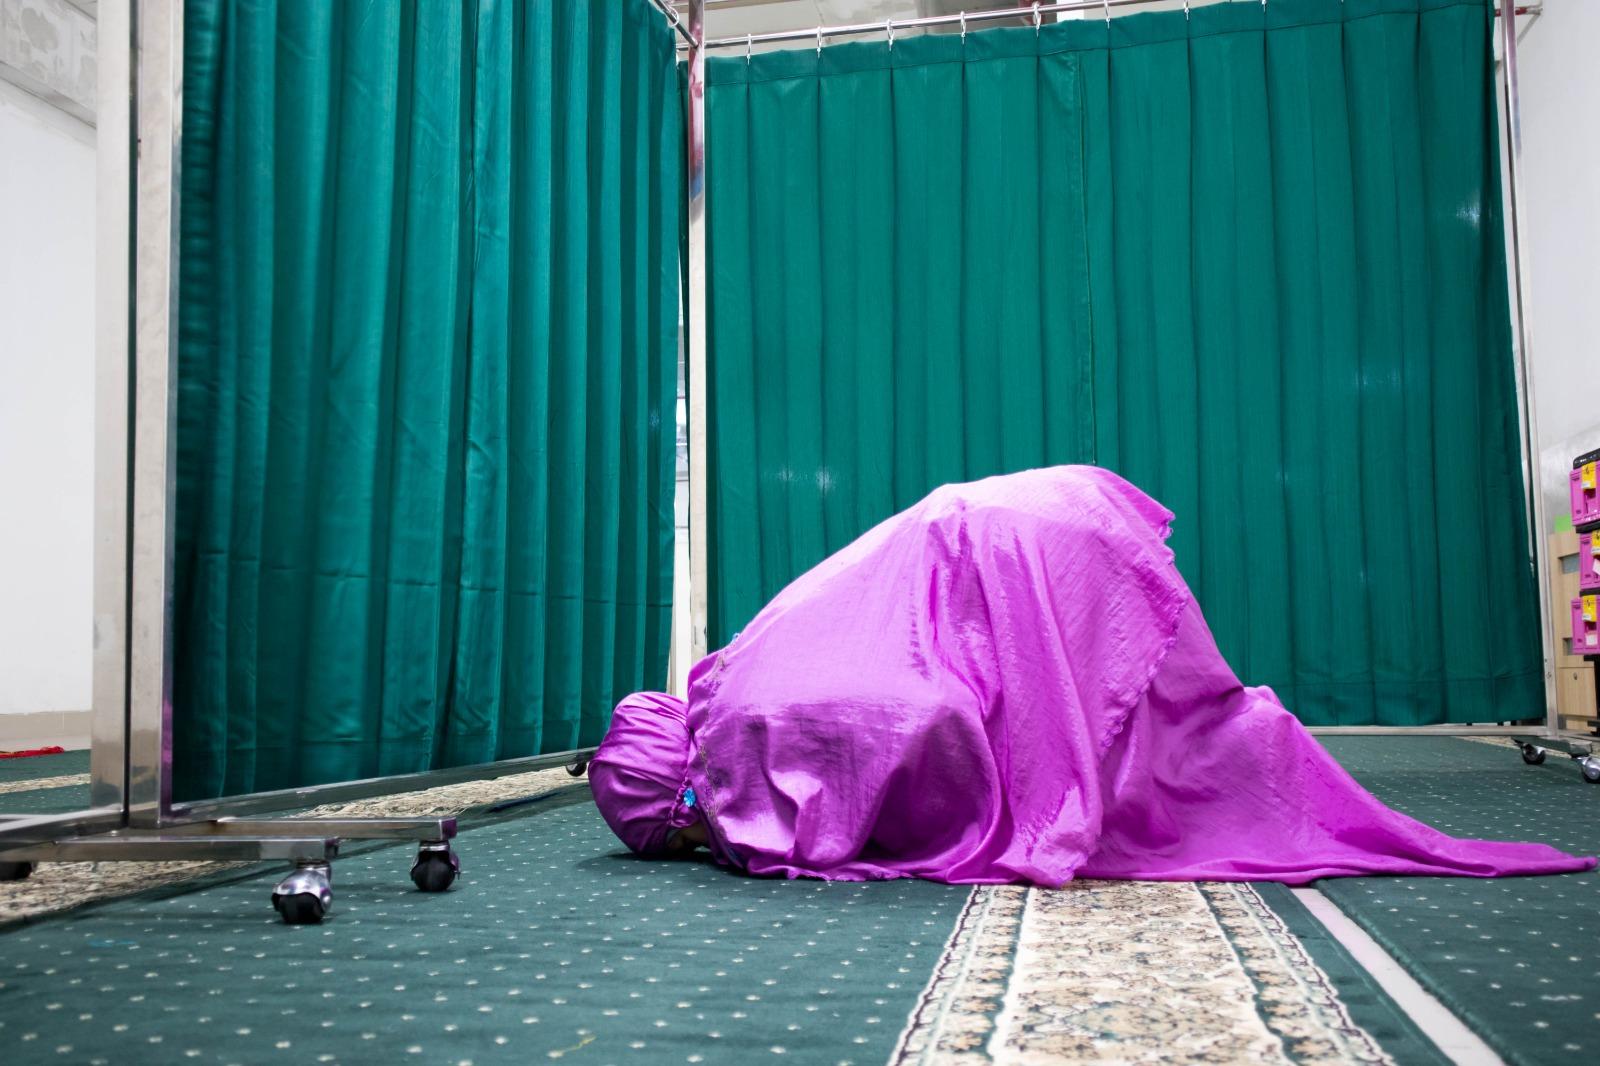 Making Sujud Ash-Shukr During Menstruation